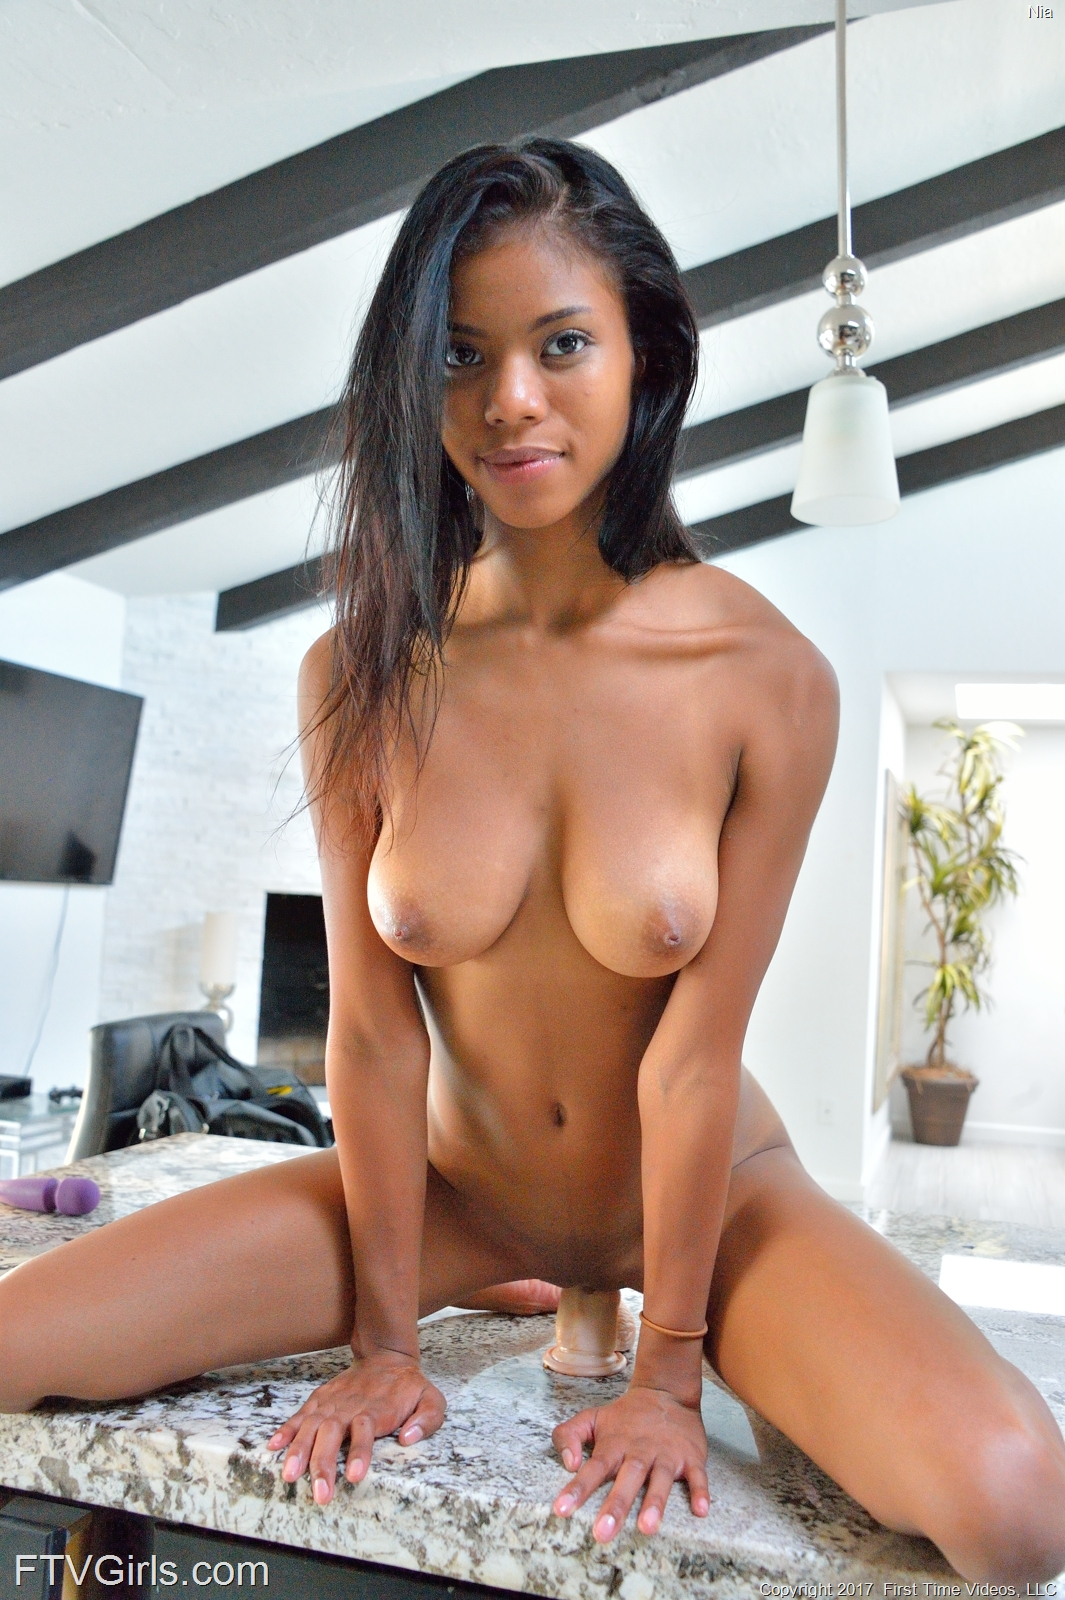 hot naked girls going down